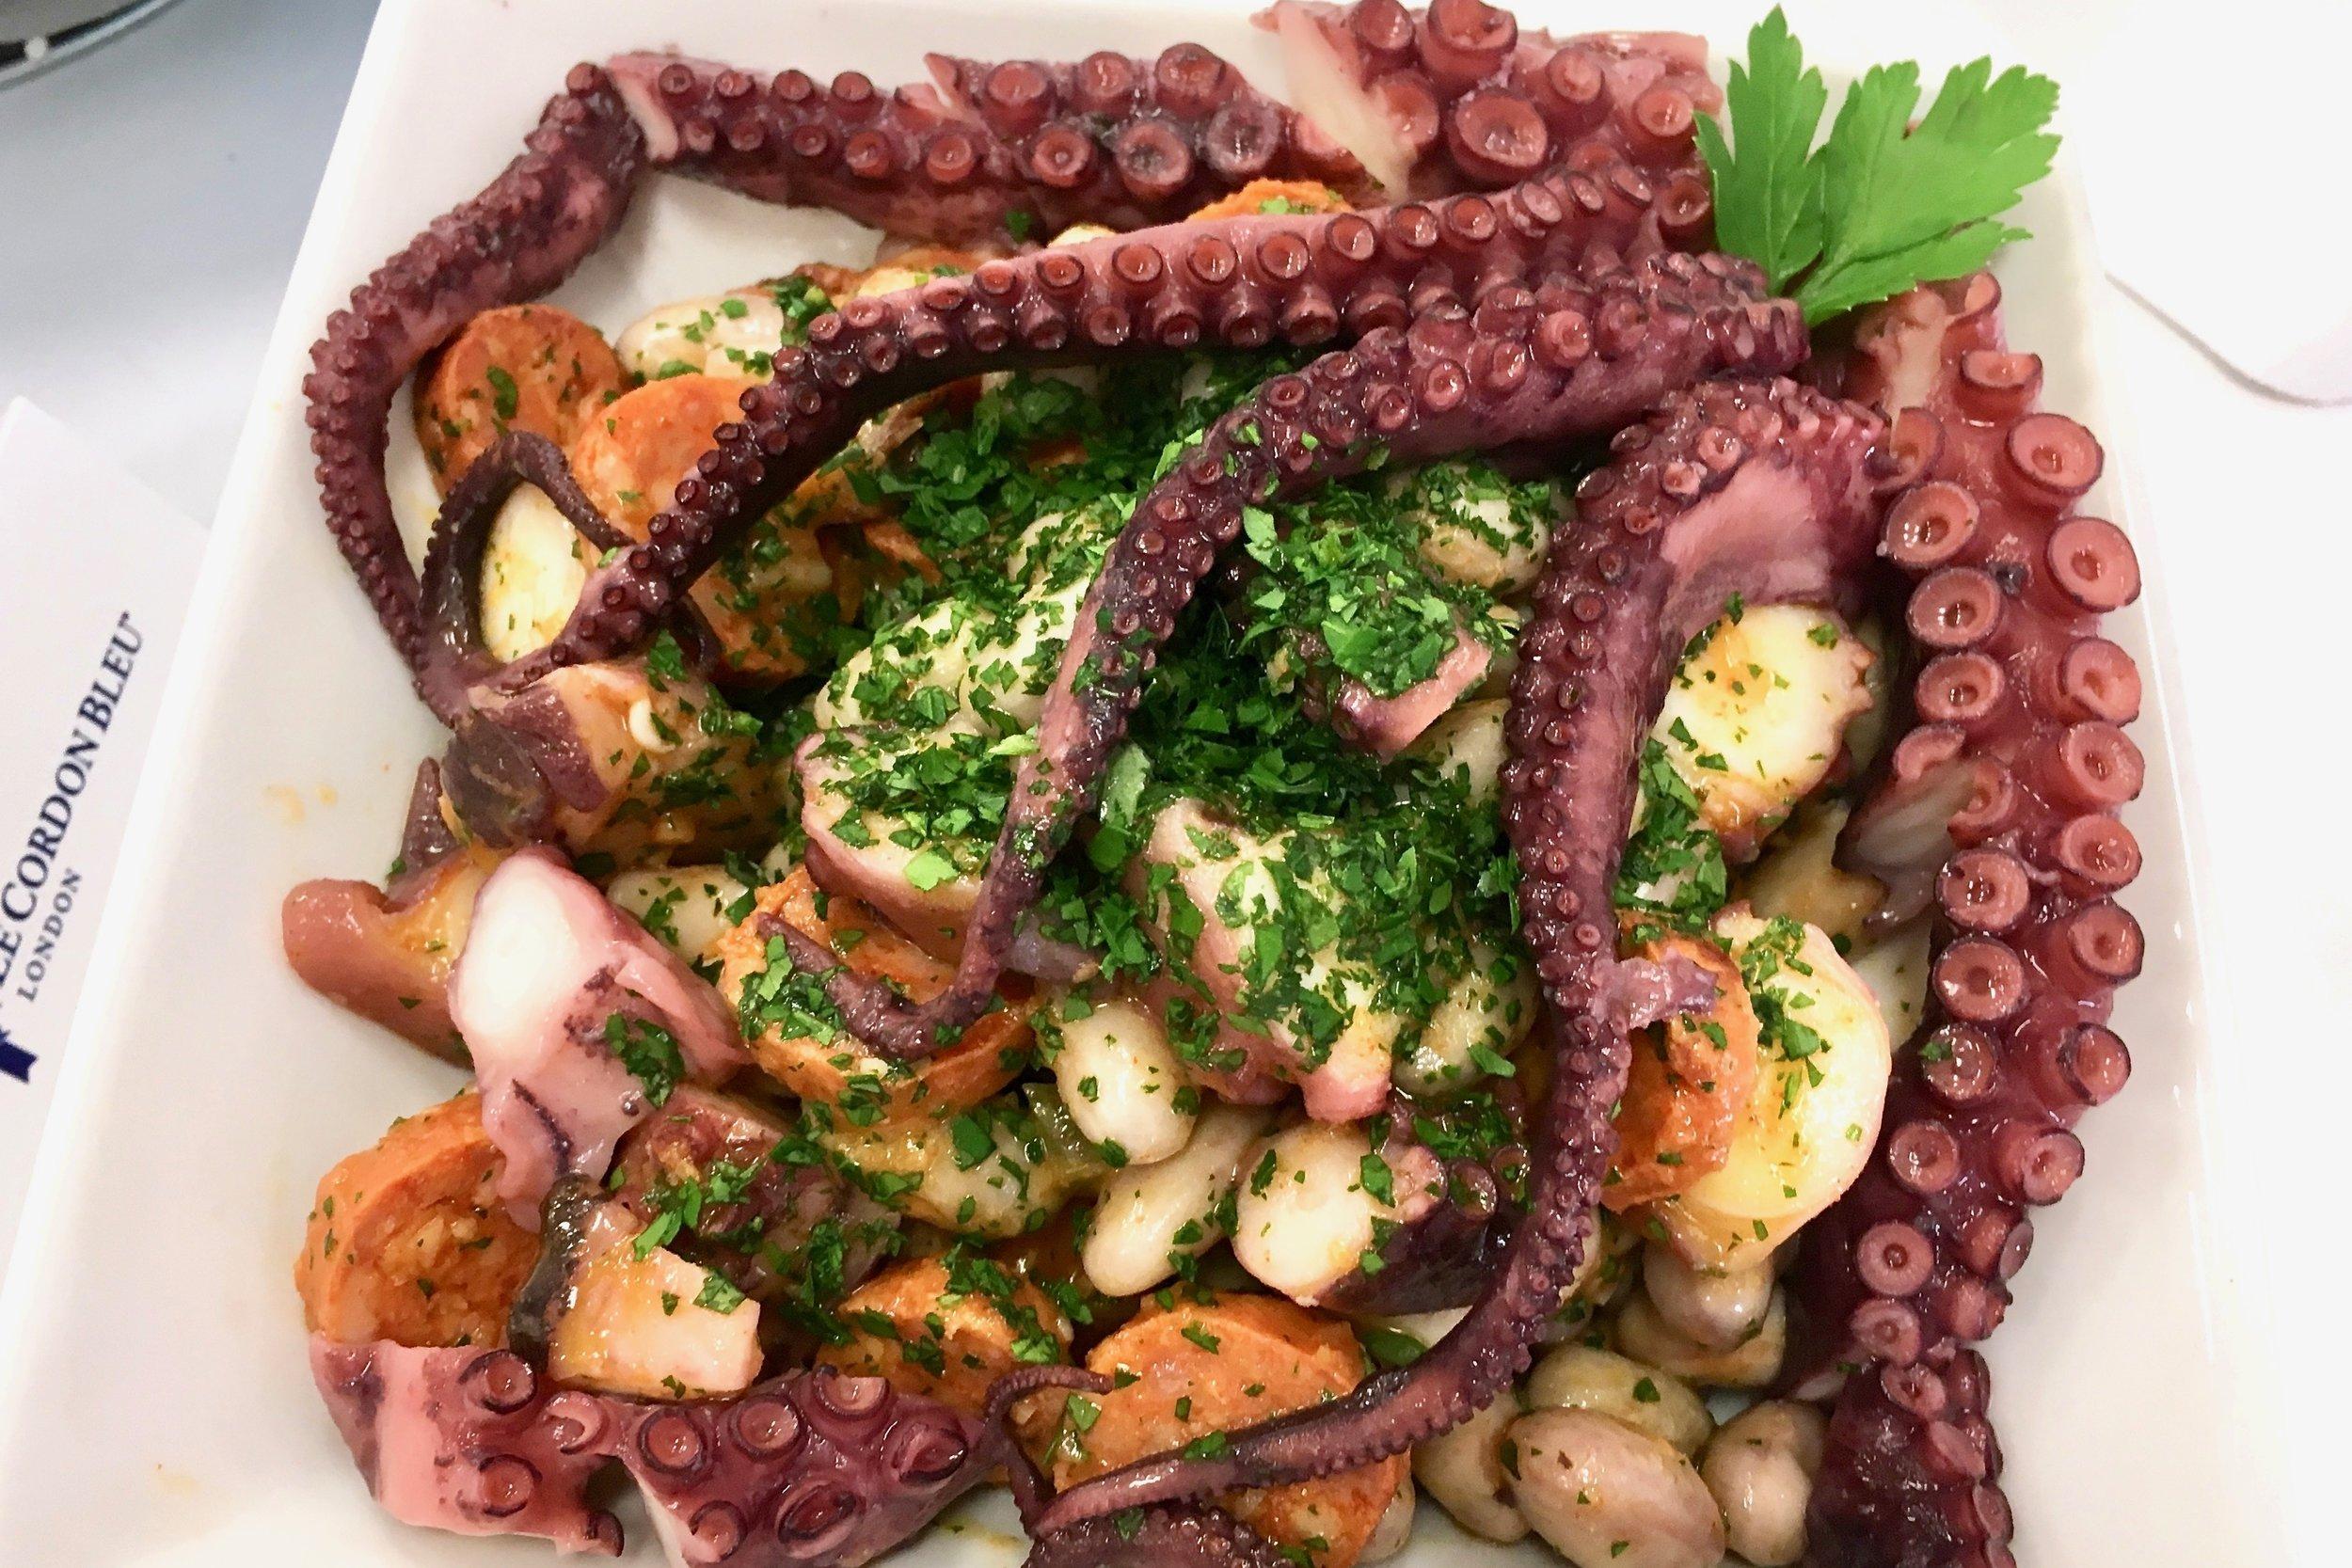 Braised octopus with chorizo, borlotti beans and garlic sauce